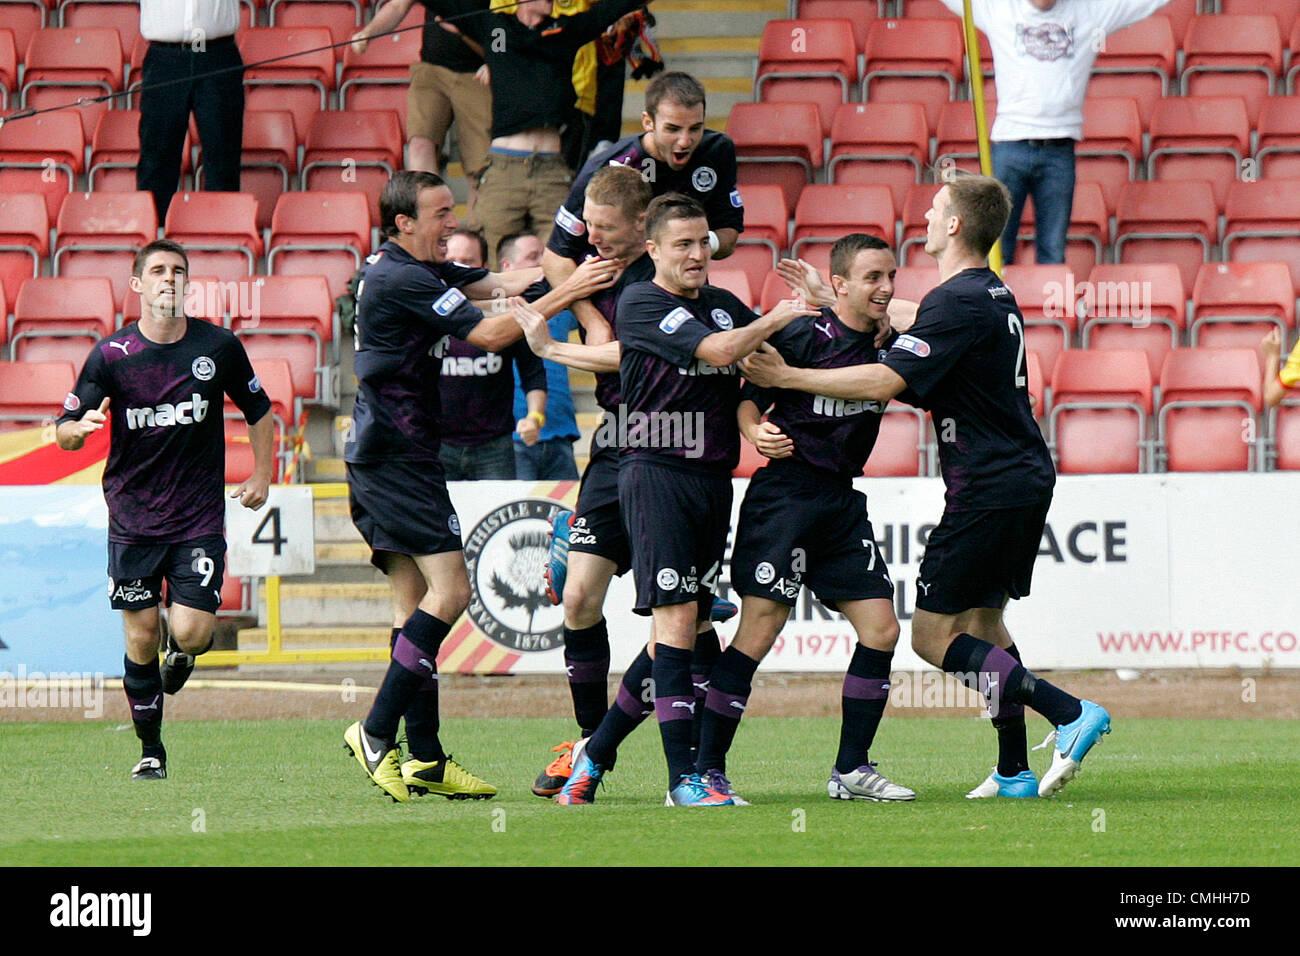 11th Aug 2012. 11.08.2012 Glasgow, Scotland.  Partick celebrate scoring their first goal during the Scottish Football - Stock Image